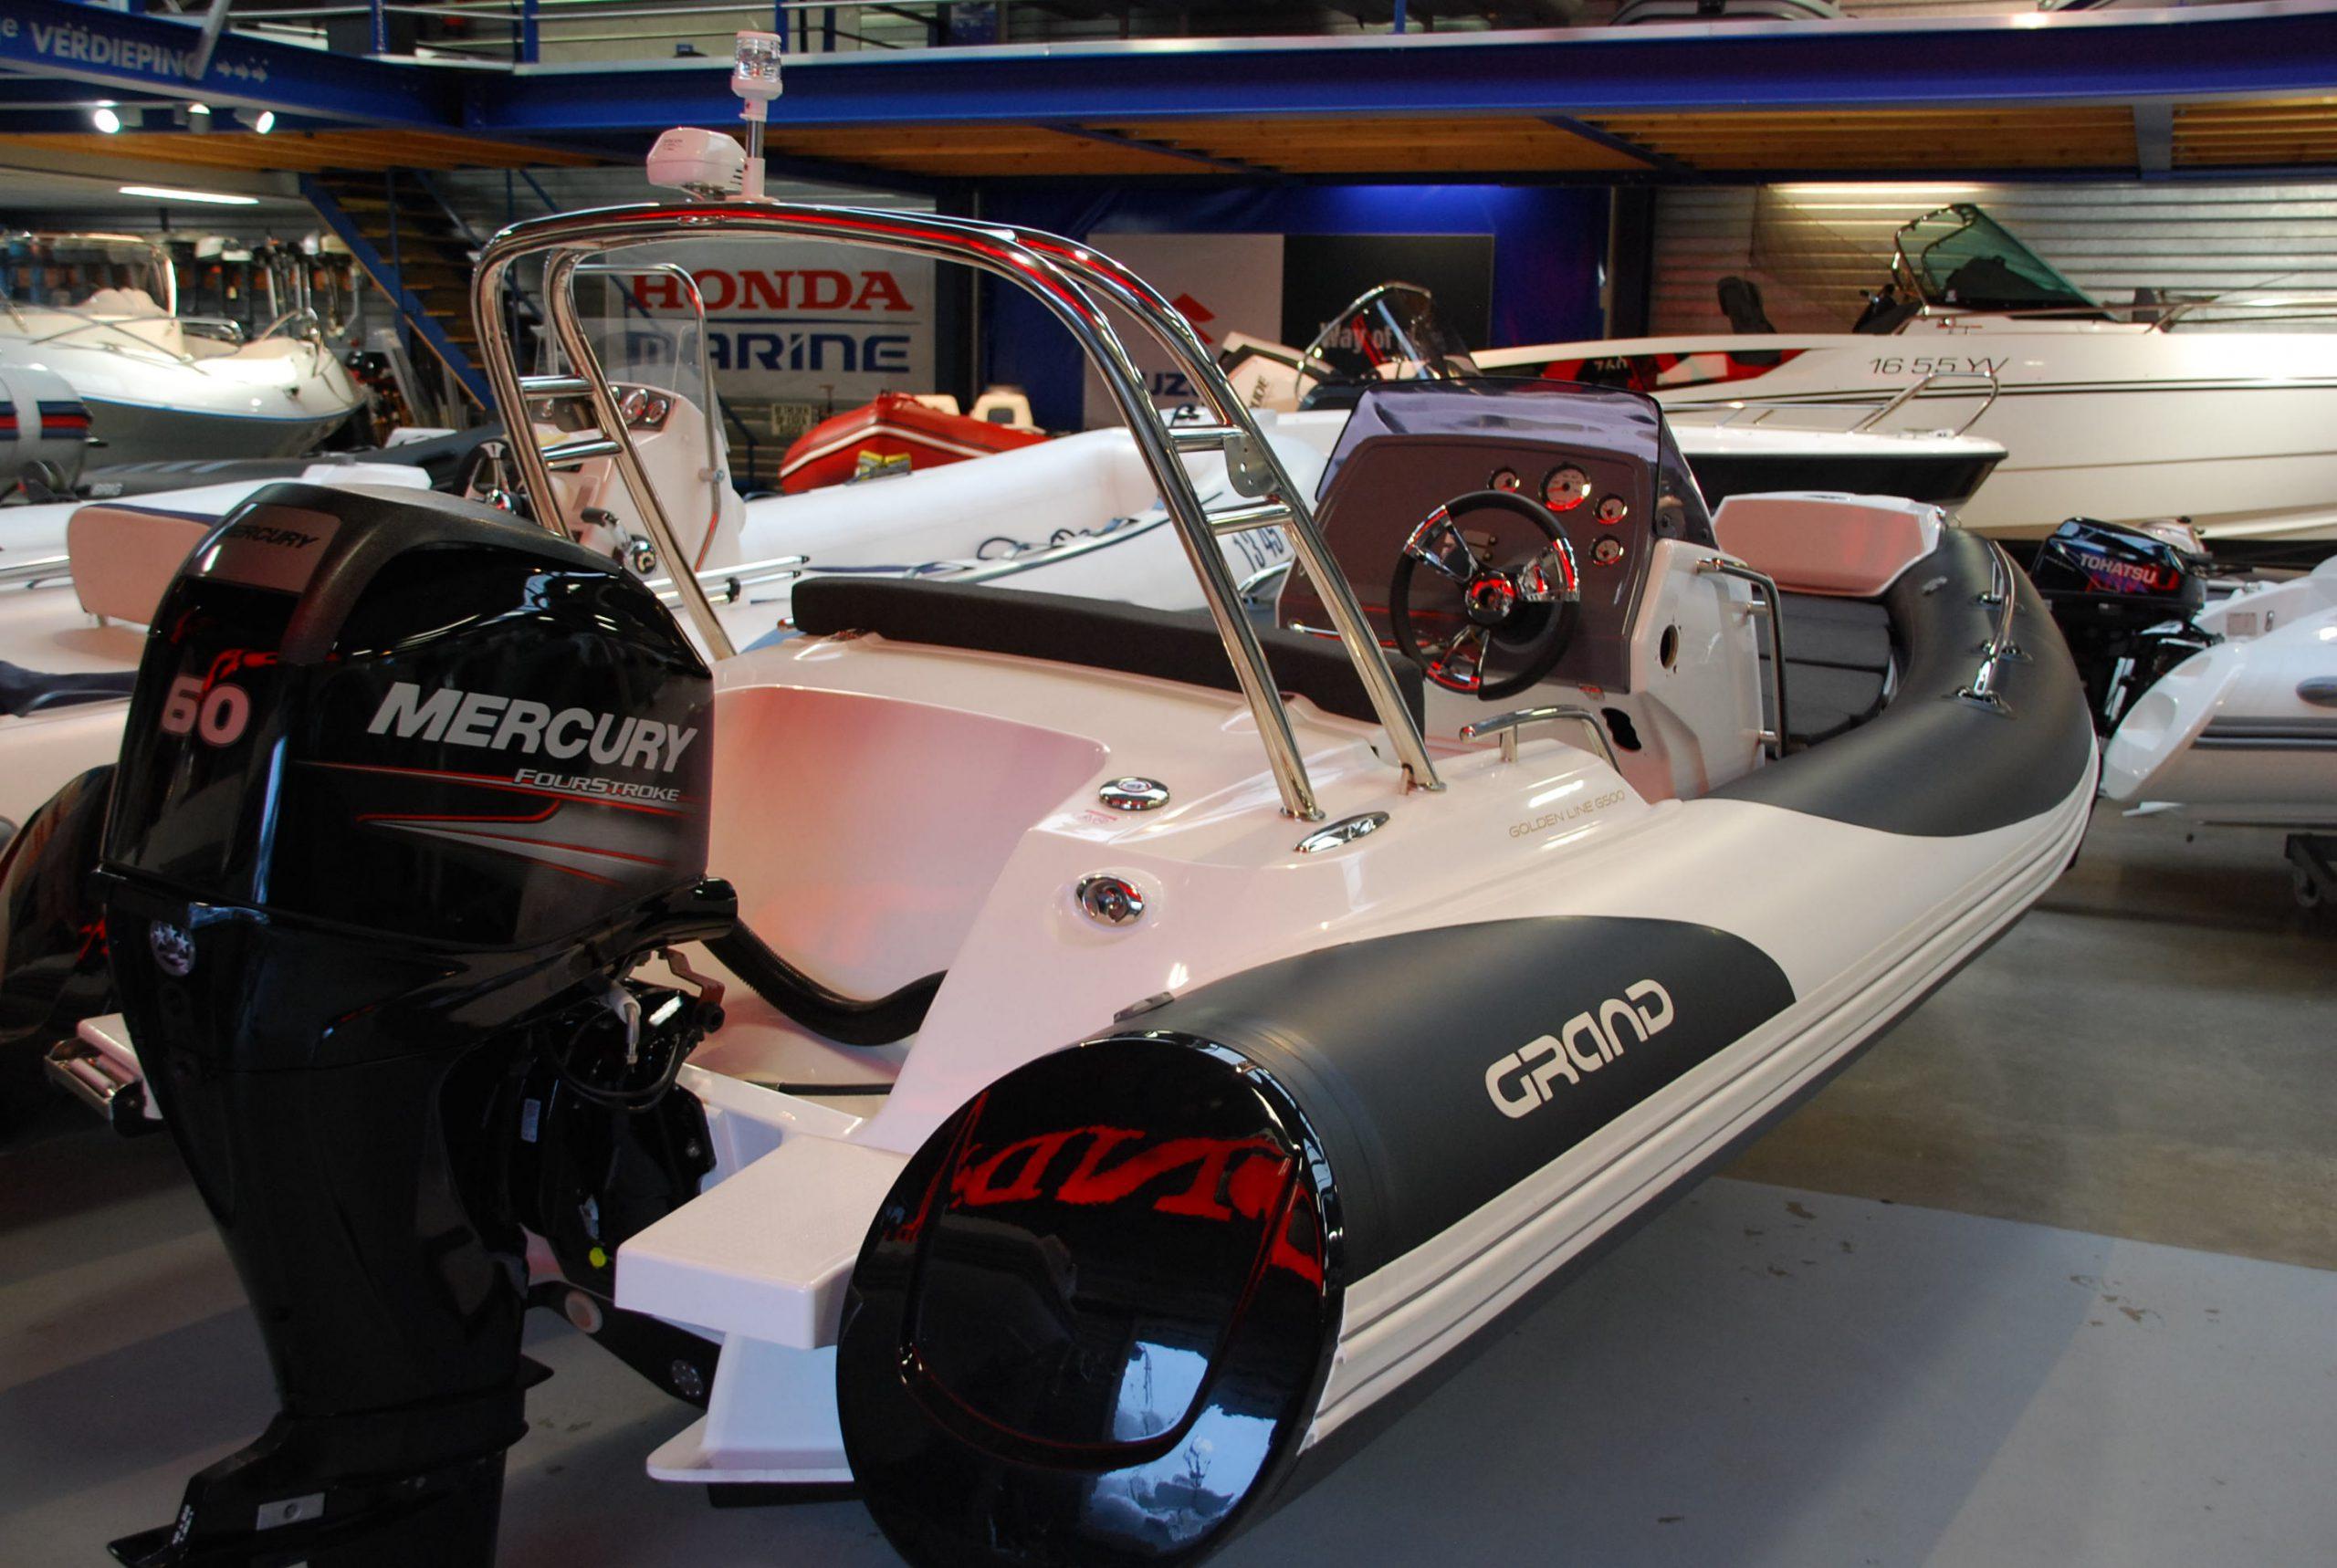 G500-1869